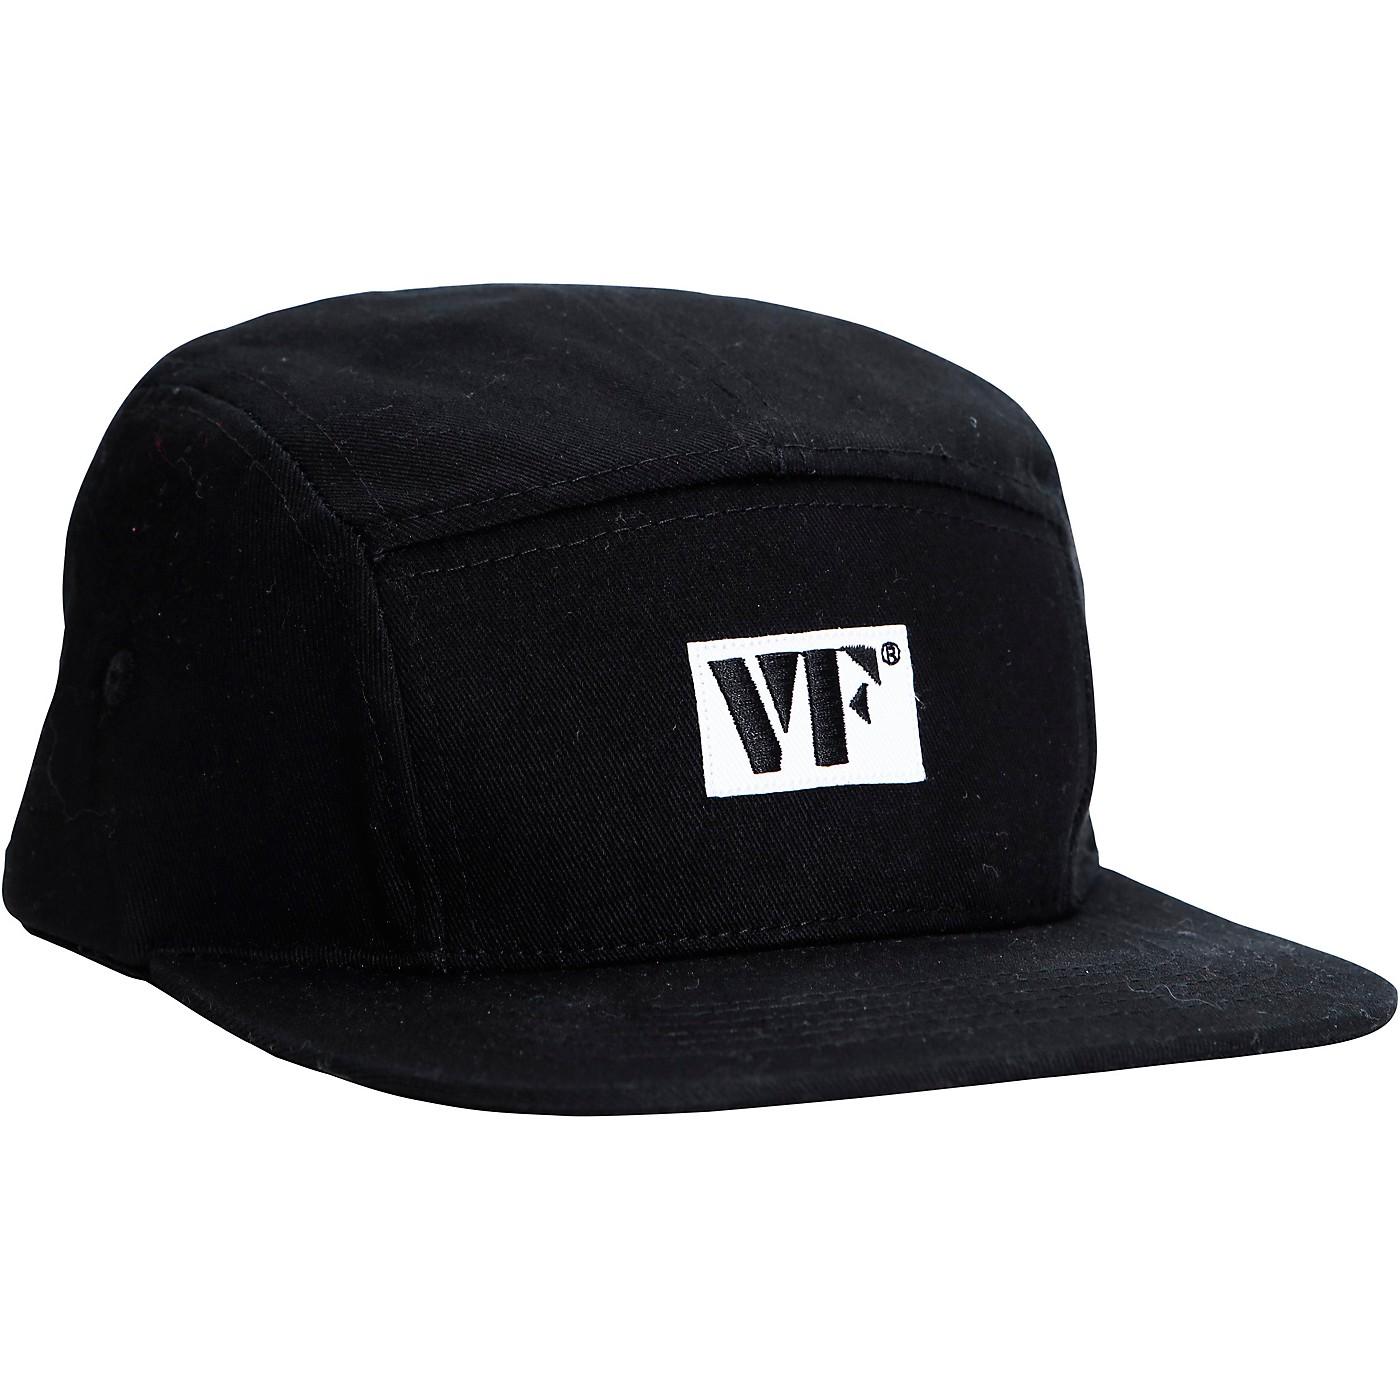 Vic Firth Black 5 Panel Camp Hat thumbnail